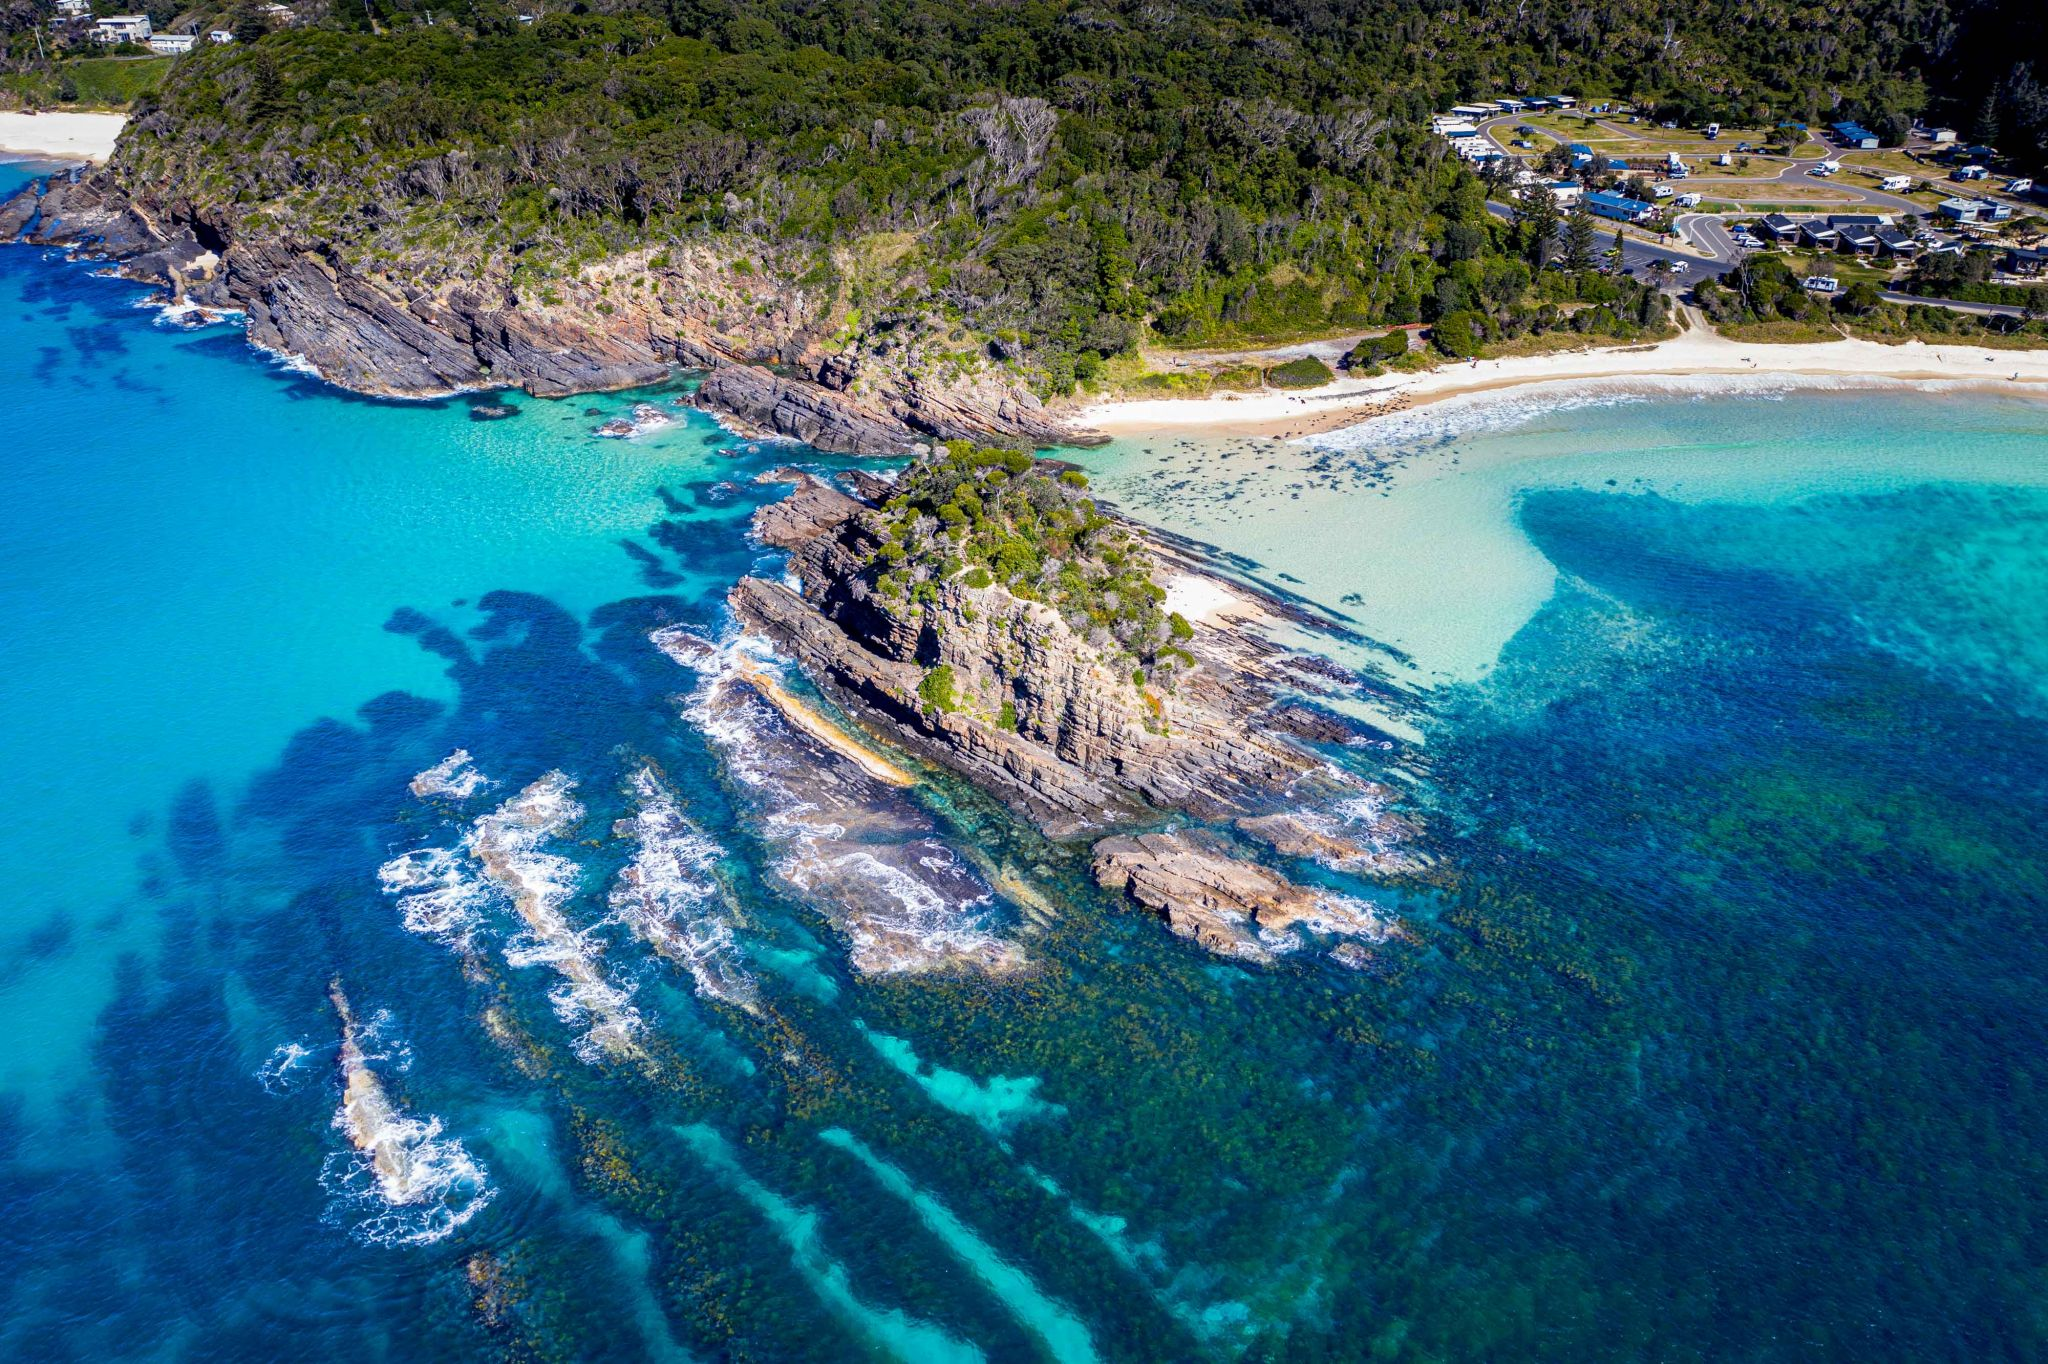 Island off Seal Rocks New South Wales, Australia